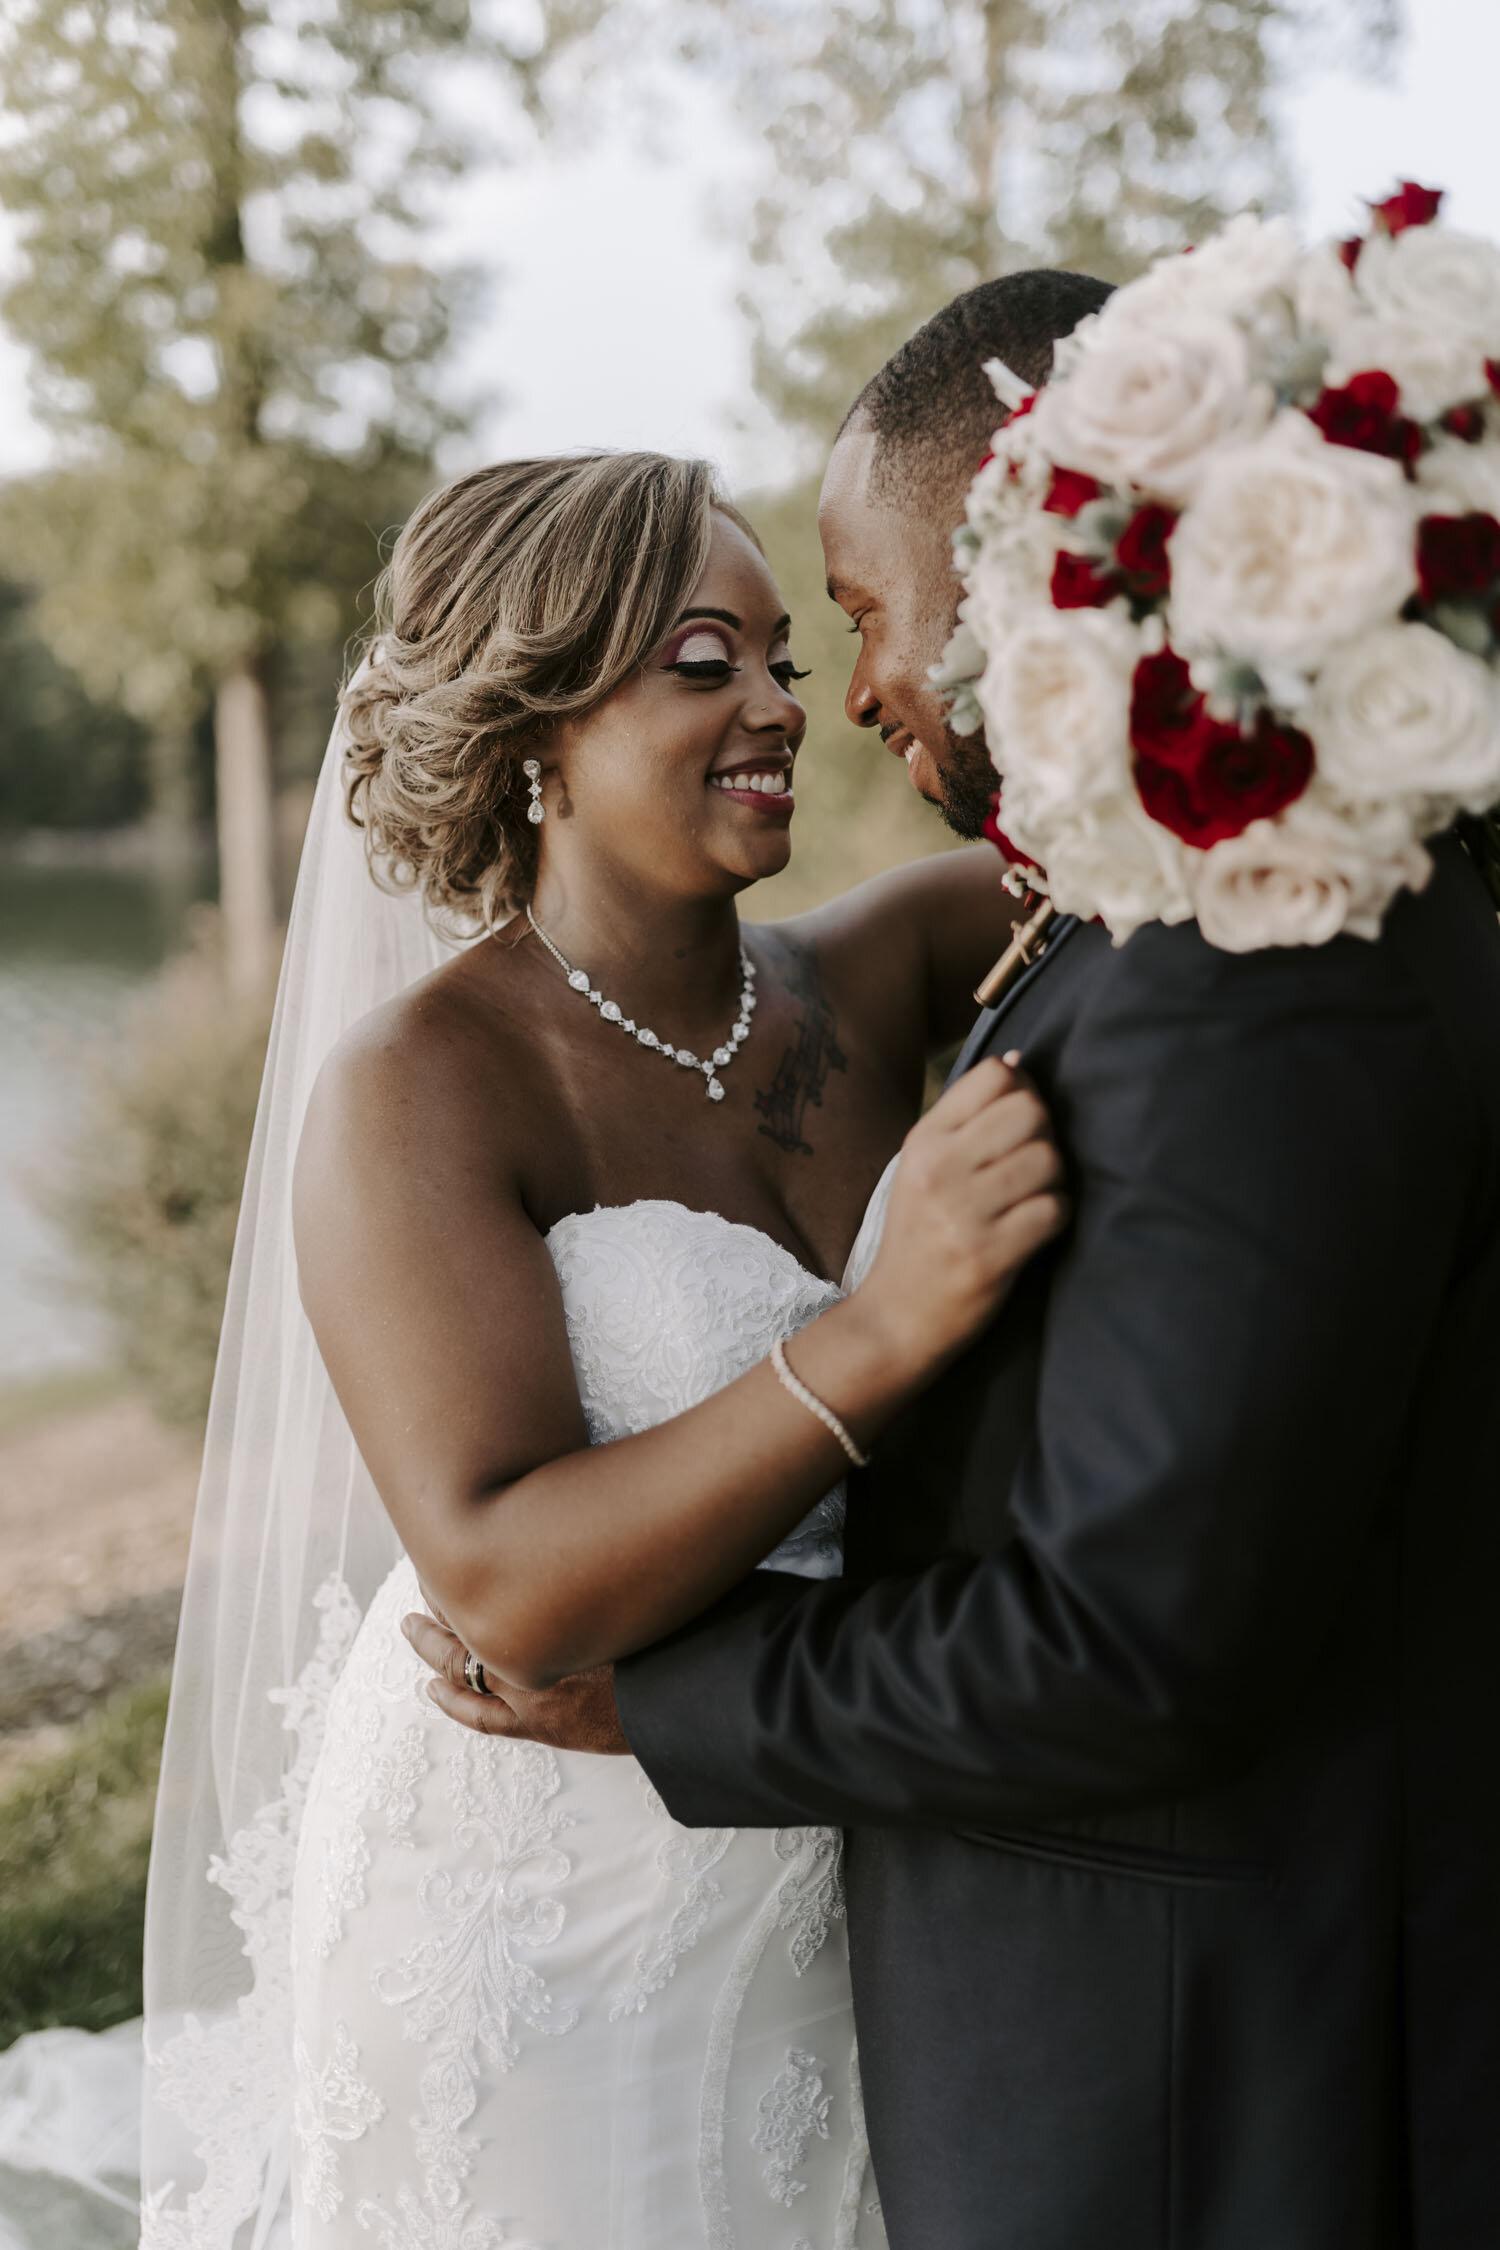 Romantic Fall Wedding at Bella Collina Mansion by Kayli LaFon Photography | Triad Area, North Carolina Wedding & Elopement Photographer